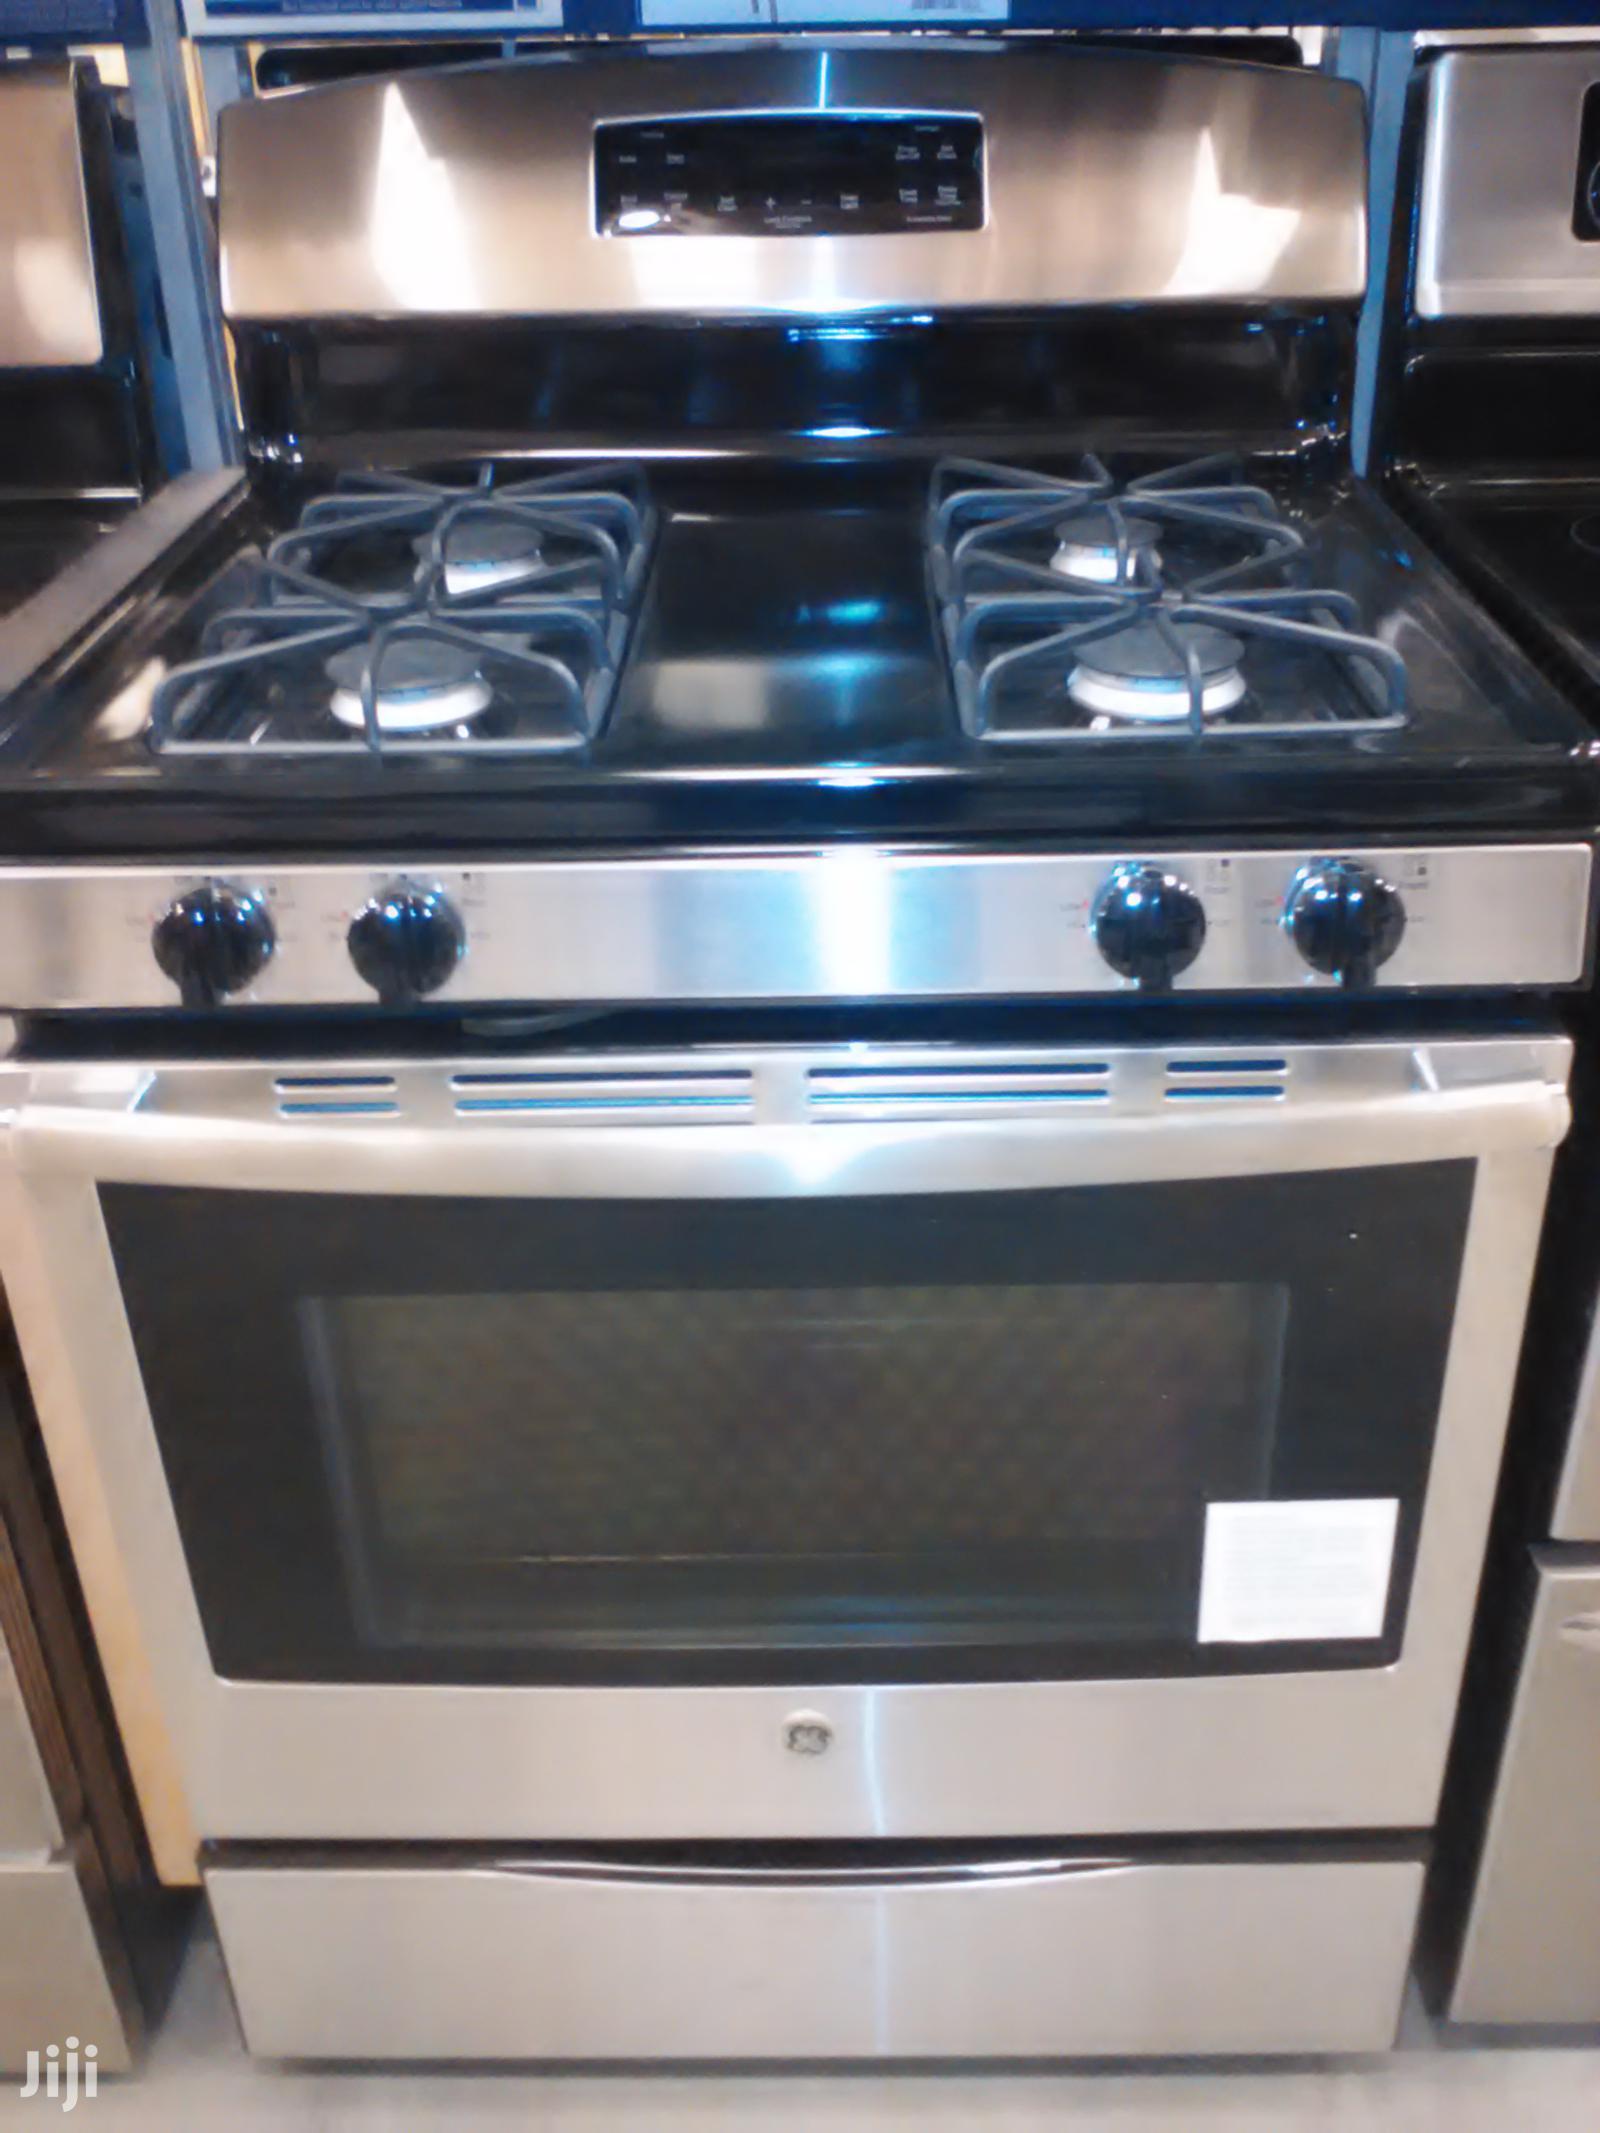 Best Appliance Repair Refrigerator Professionals-Honest Affordable